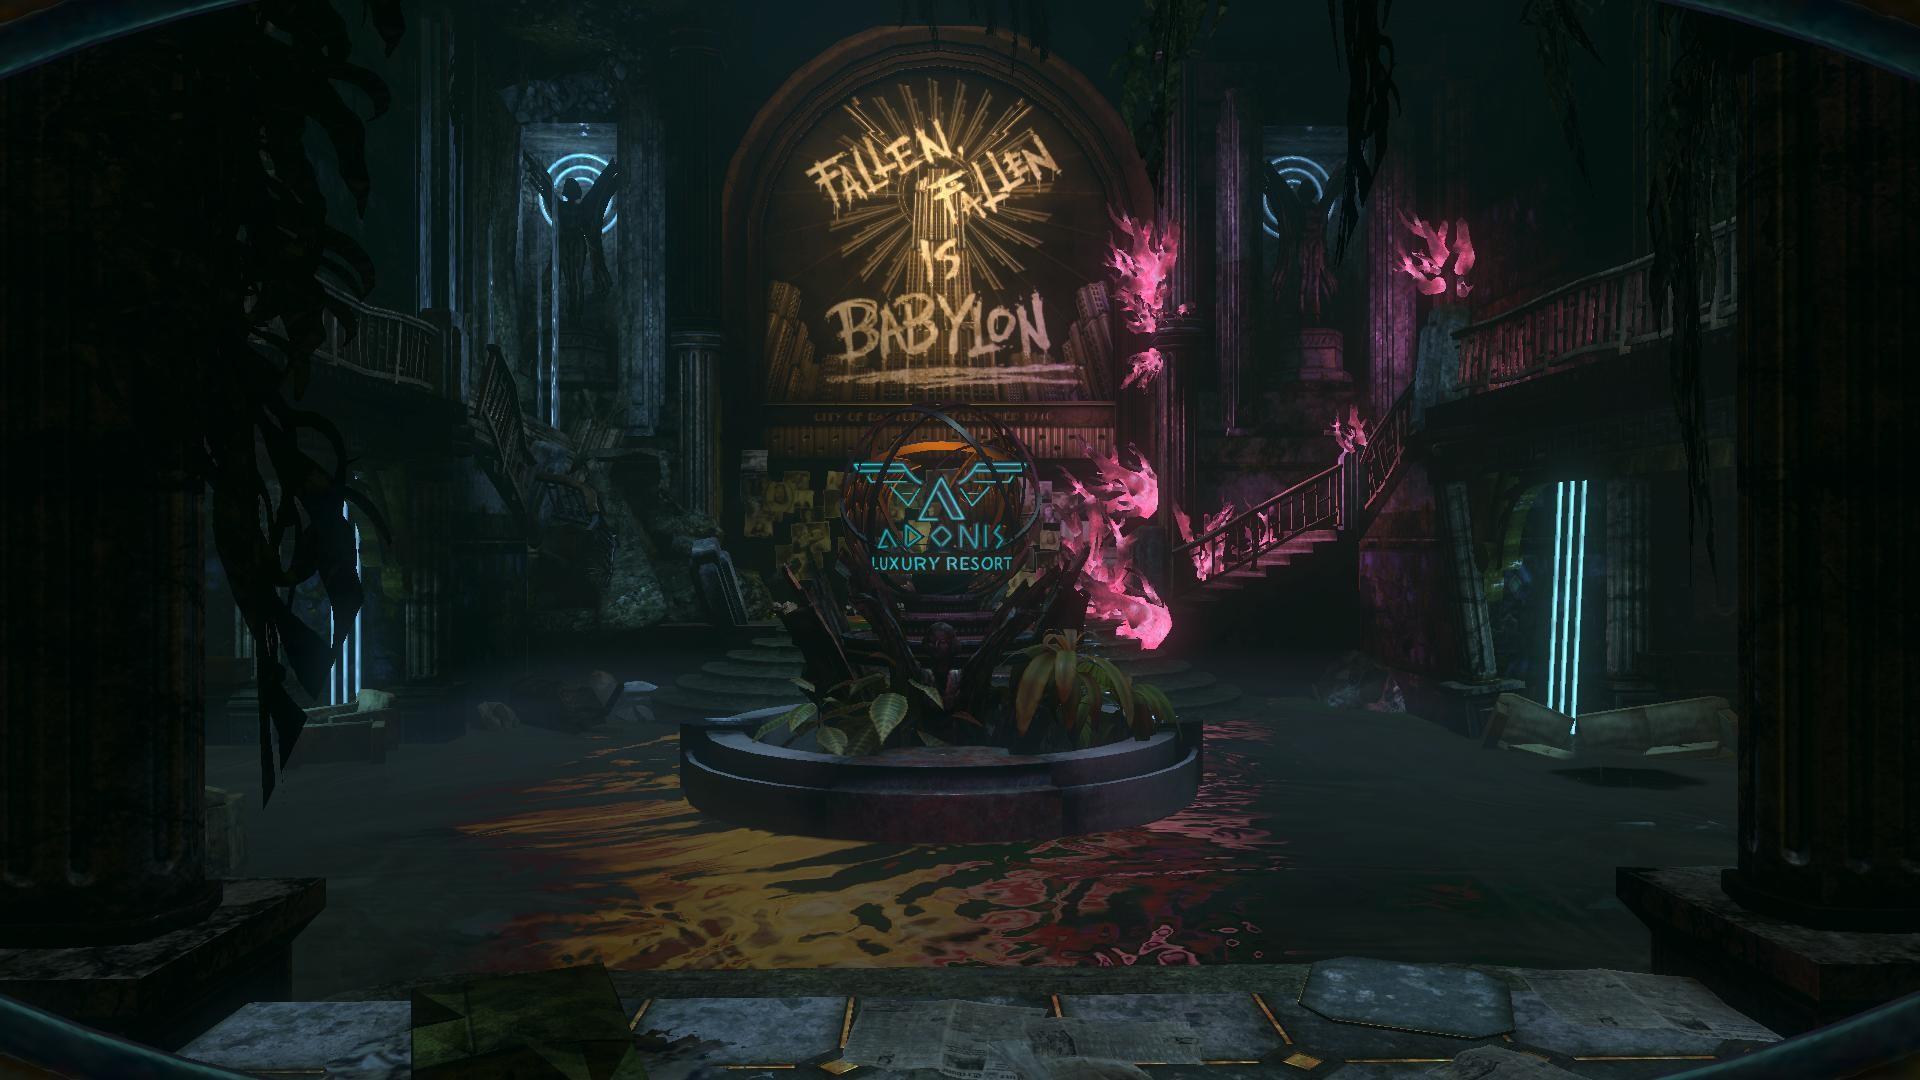 Video games BioShock Rapture wallpaper | | 232785 | WallpaperUP